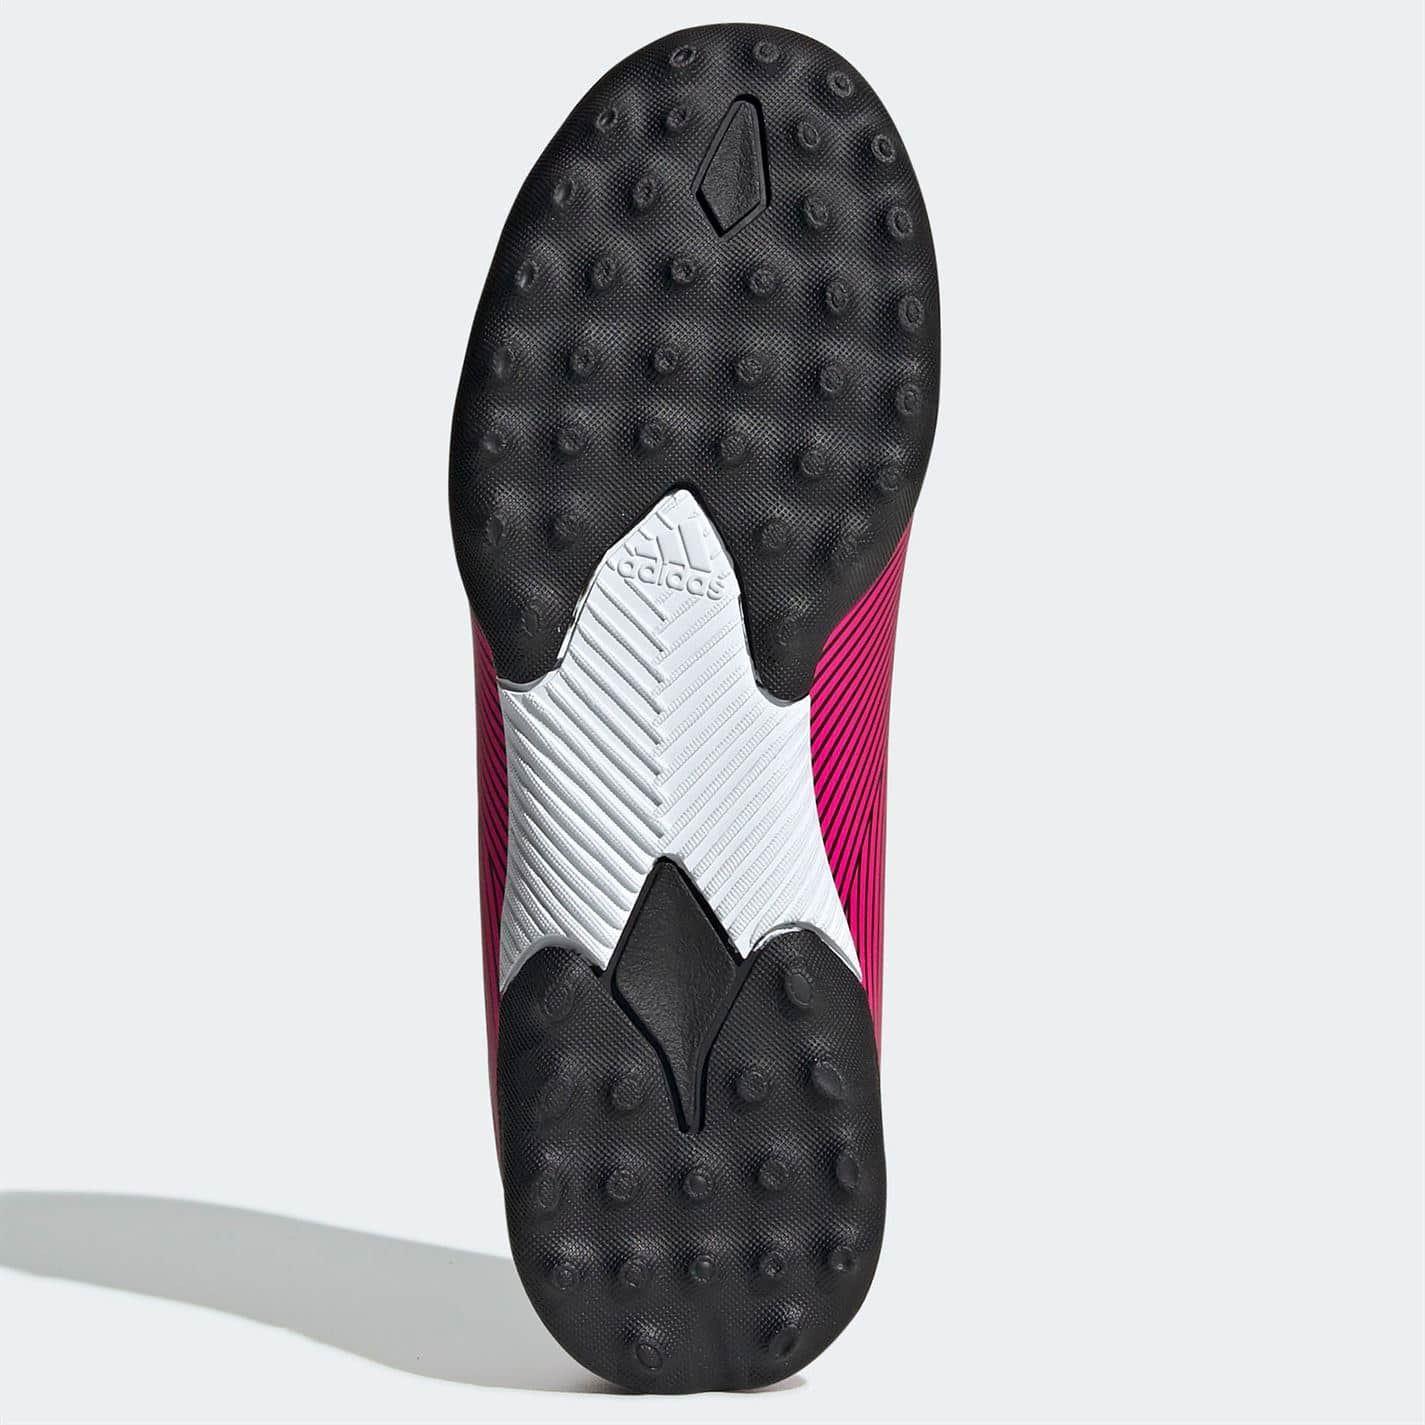 ADIDAS NEMEZIZ TANGO 17.3 BLACK ASTRO TURF FOOTBALL TRAINERS SHOES UK 6 | eBay